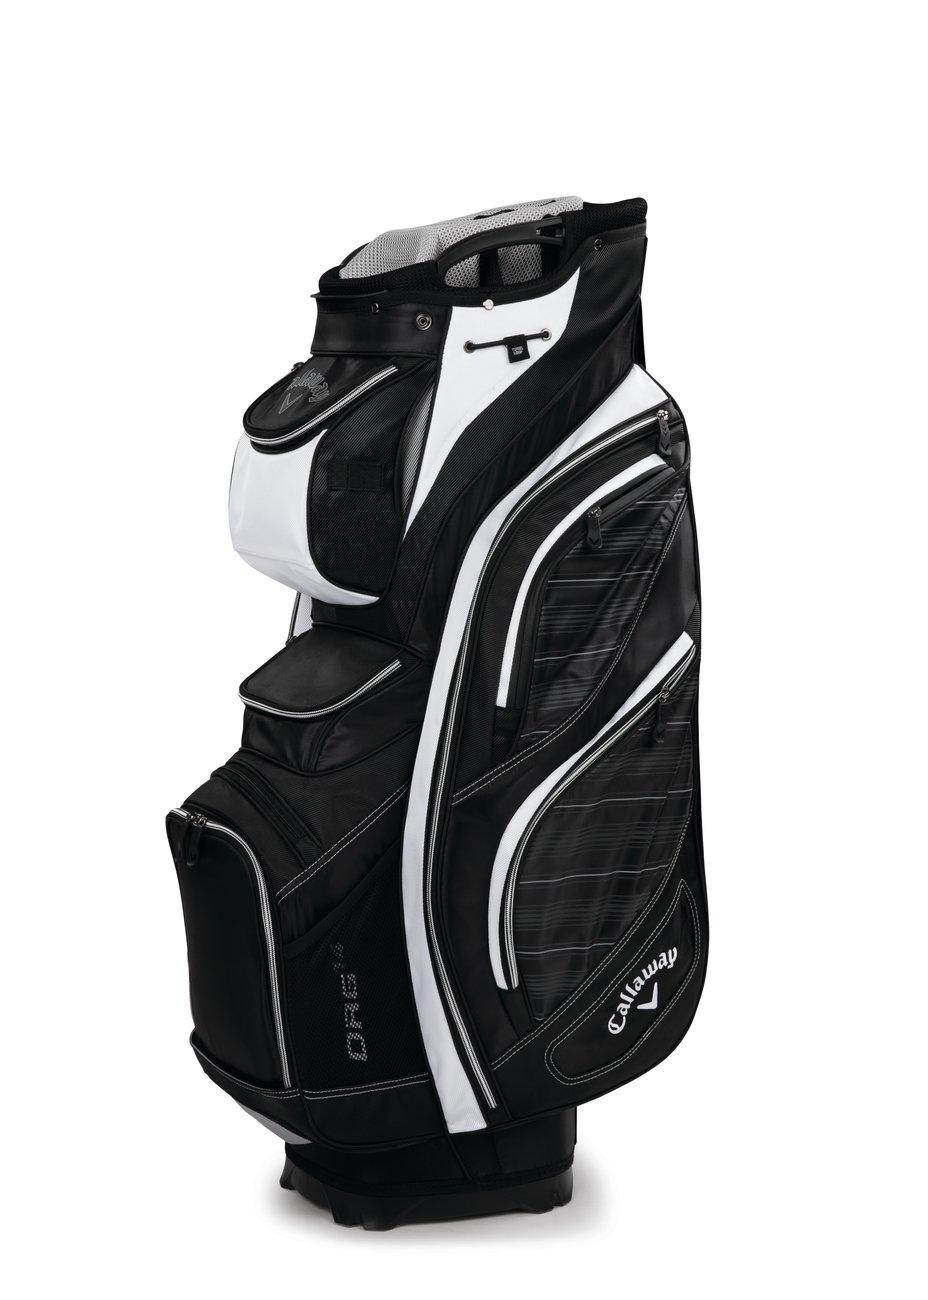 Callaway Org 14ゴルフカートバッグ B0185LPZF0 ブラック/グレー/ホワイト ブラック/グレー/ホワイト